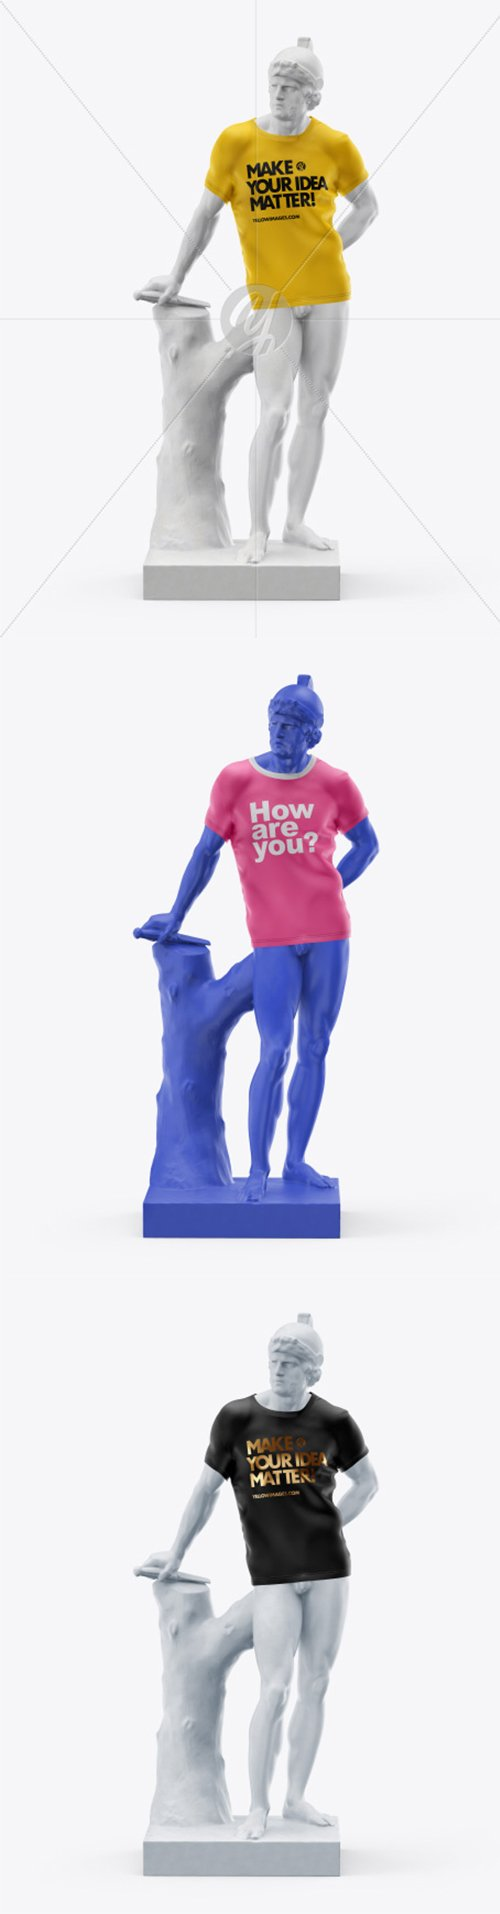 Mans Statue Wearing a T-Shirt Mockup 37034 TIF